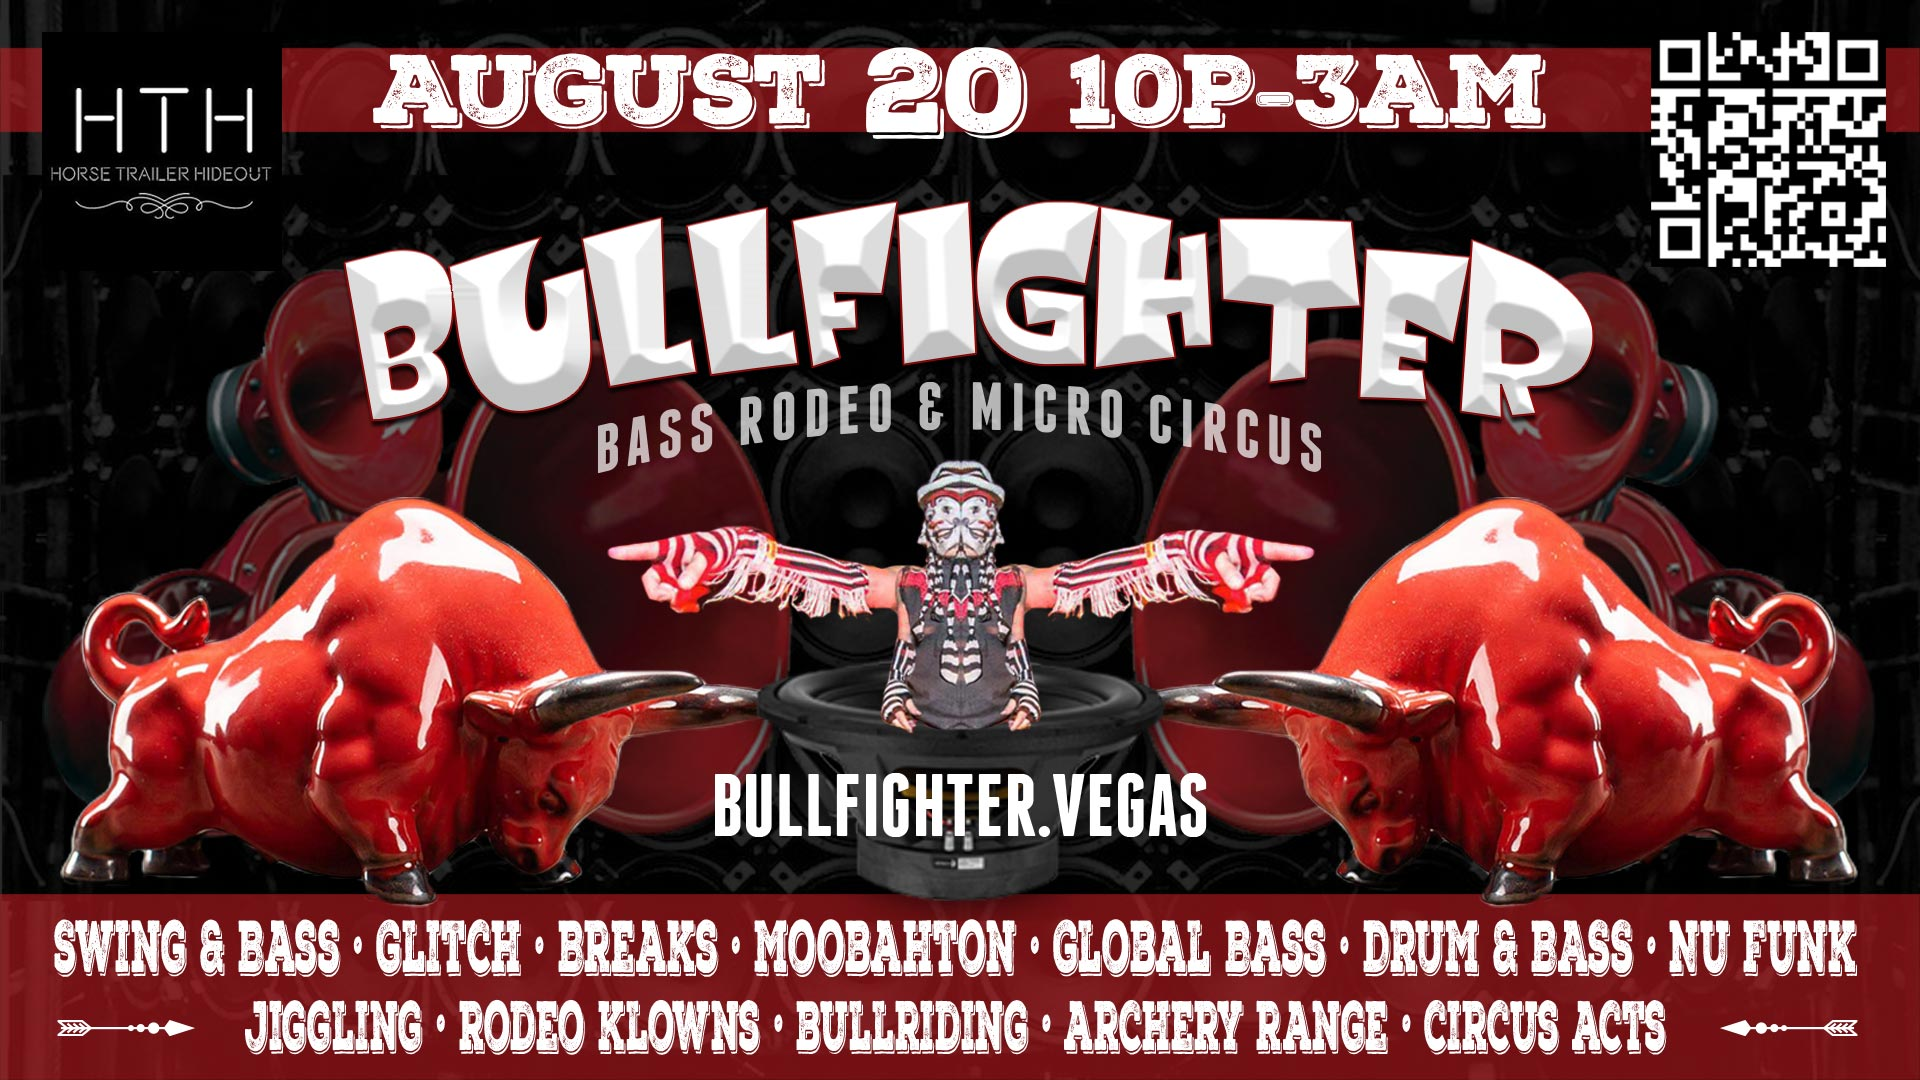 Bullfighter - Bass Rodeo & Micro Circus - August 20, 2021 - Horse Trailer Hideout, Las Vegas